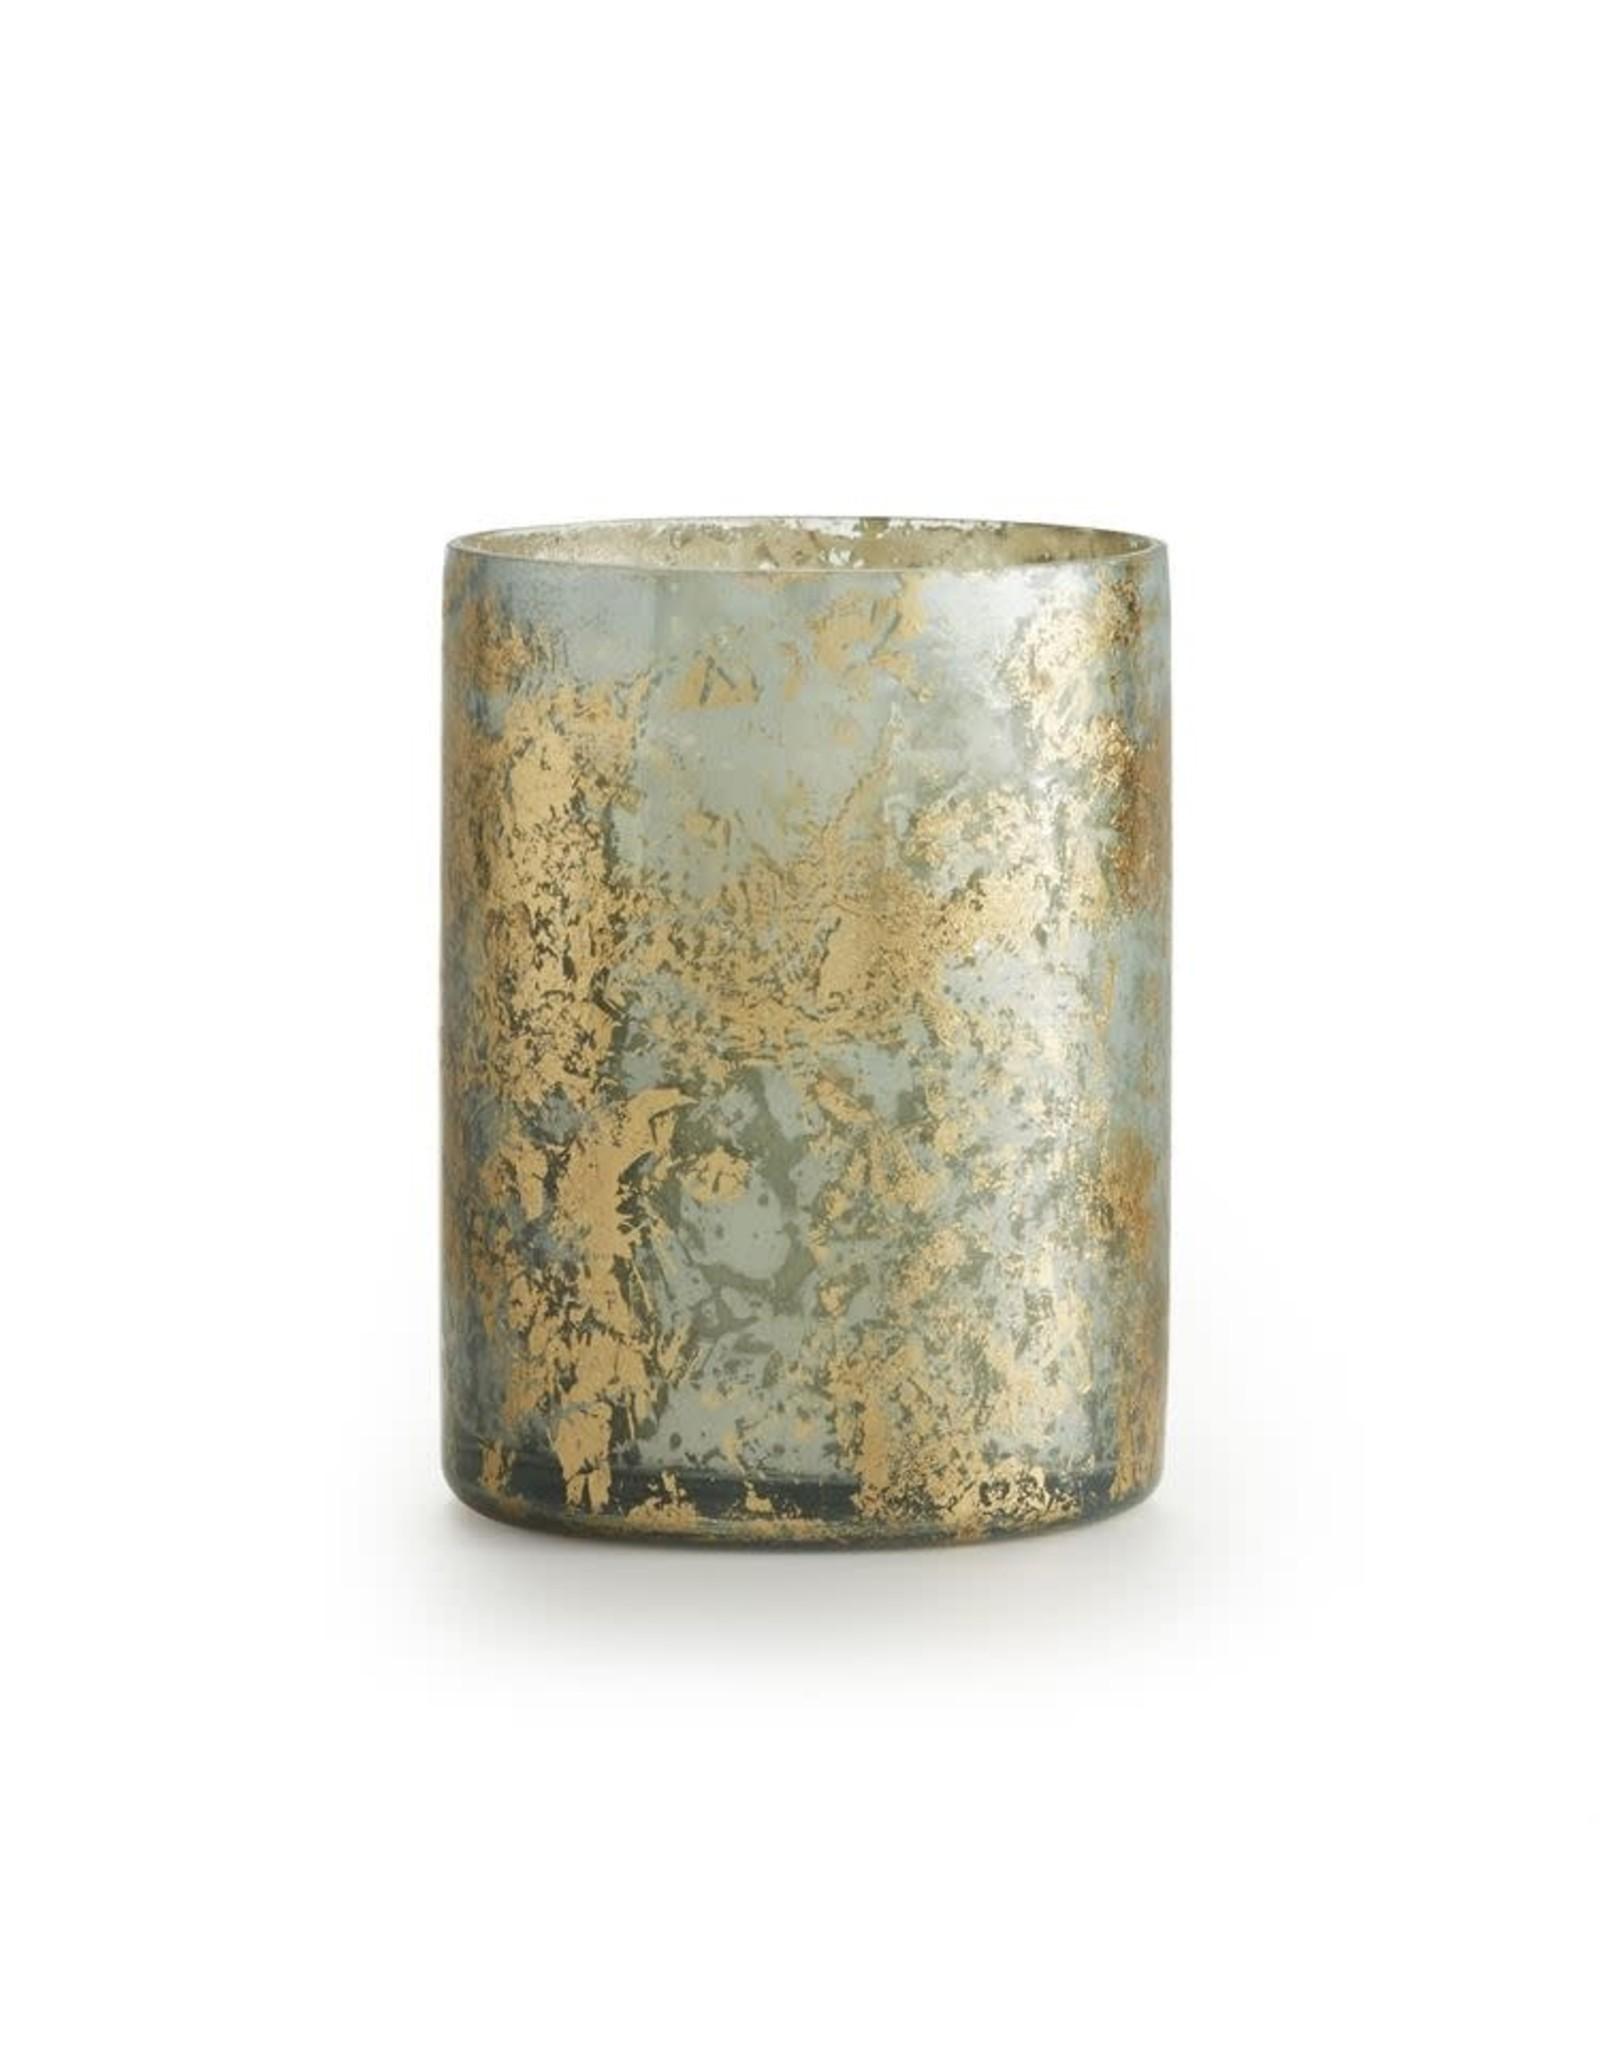 Illume 8.5 oz Emory Glass Candle - Sugared Blossom